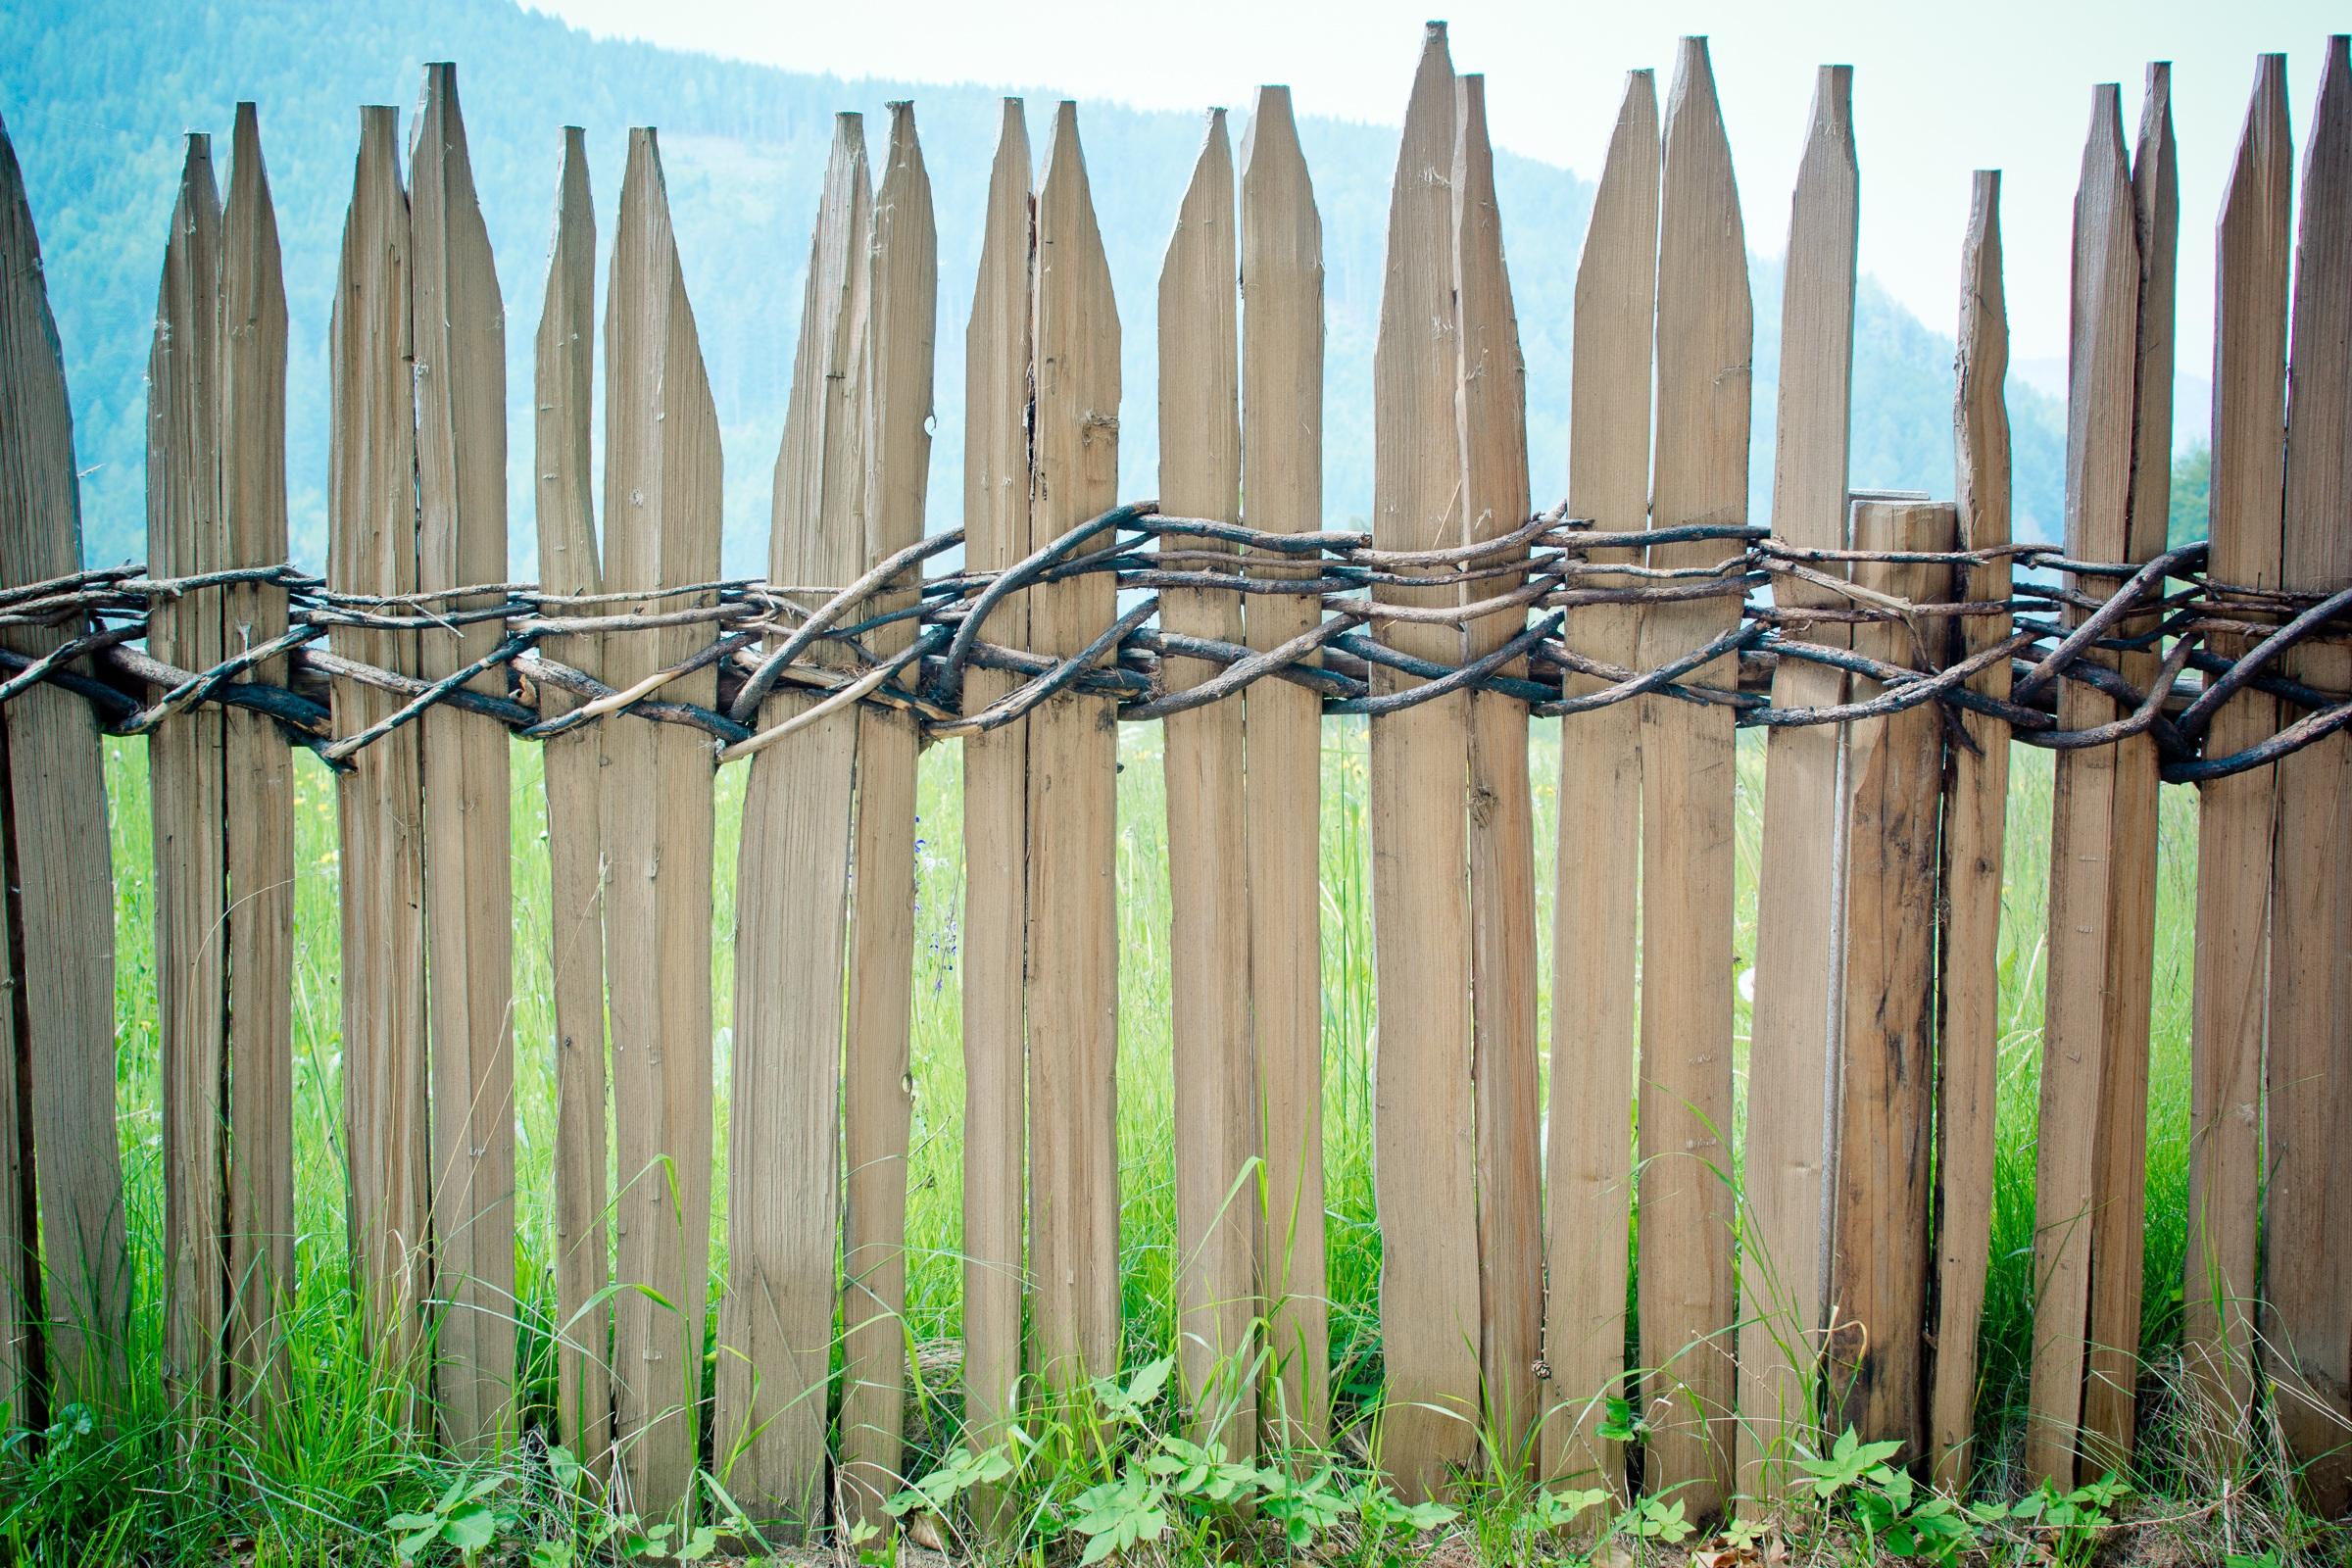 Gratis afbeeldingen natuur tak hek hout bloem itali landbouw takje vlecht vlechtwerk - Bamboe hek ...